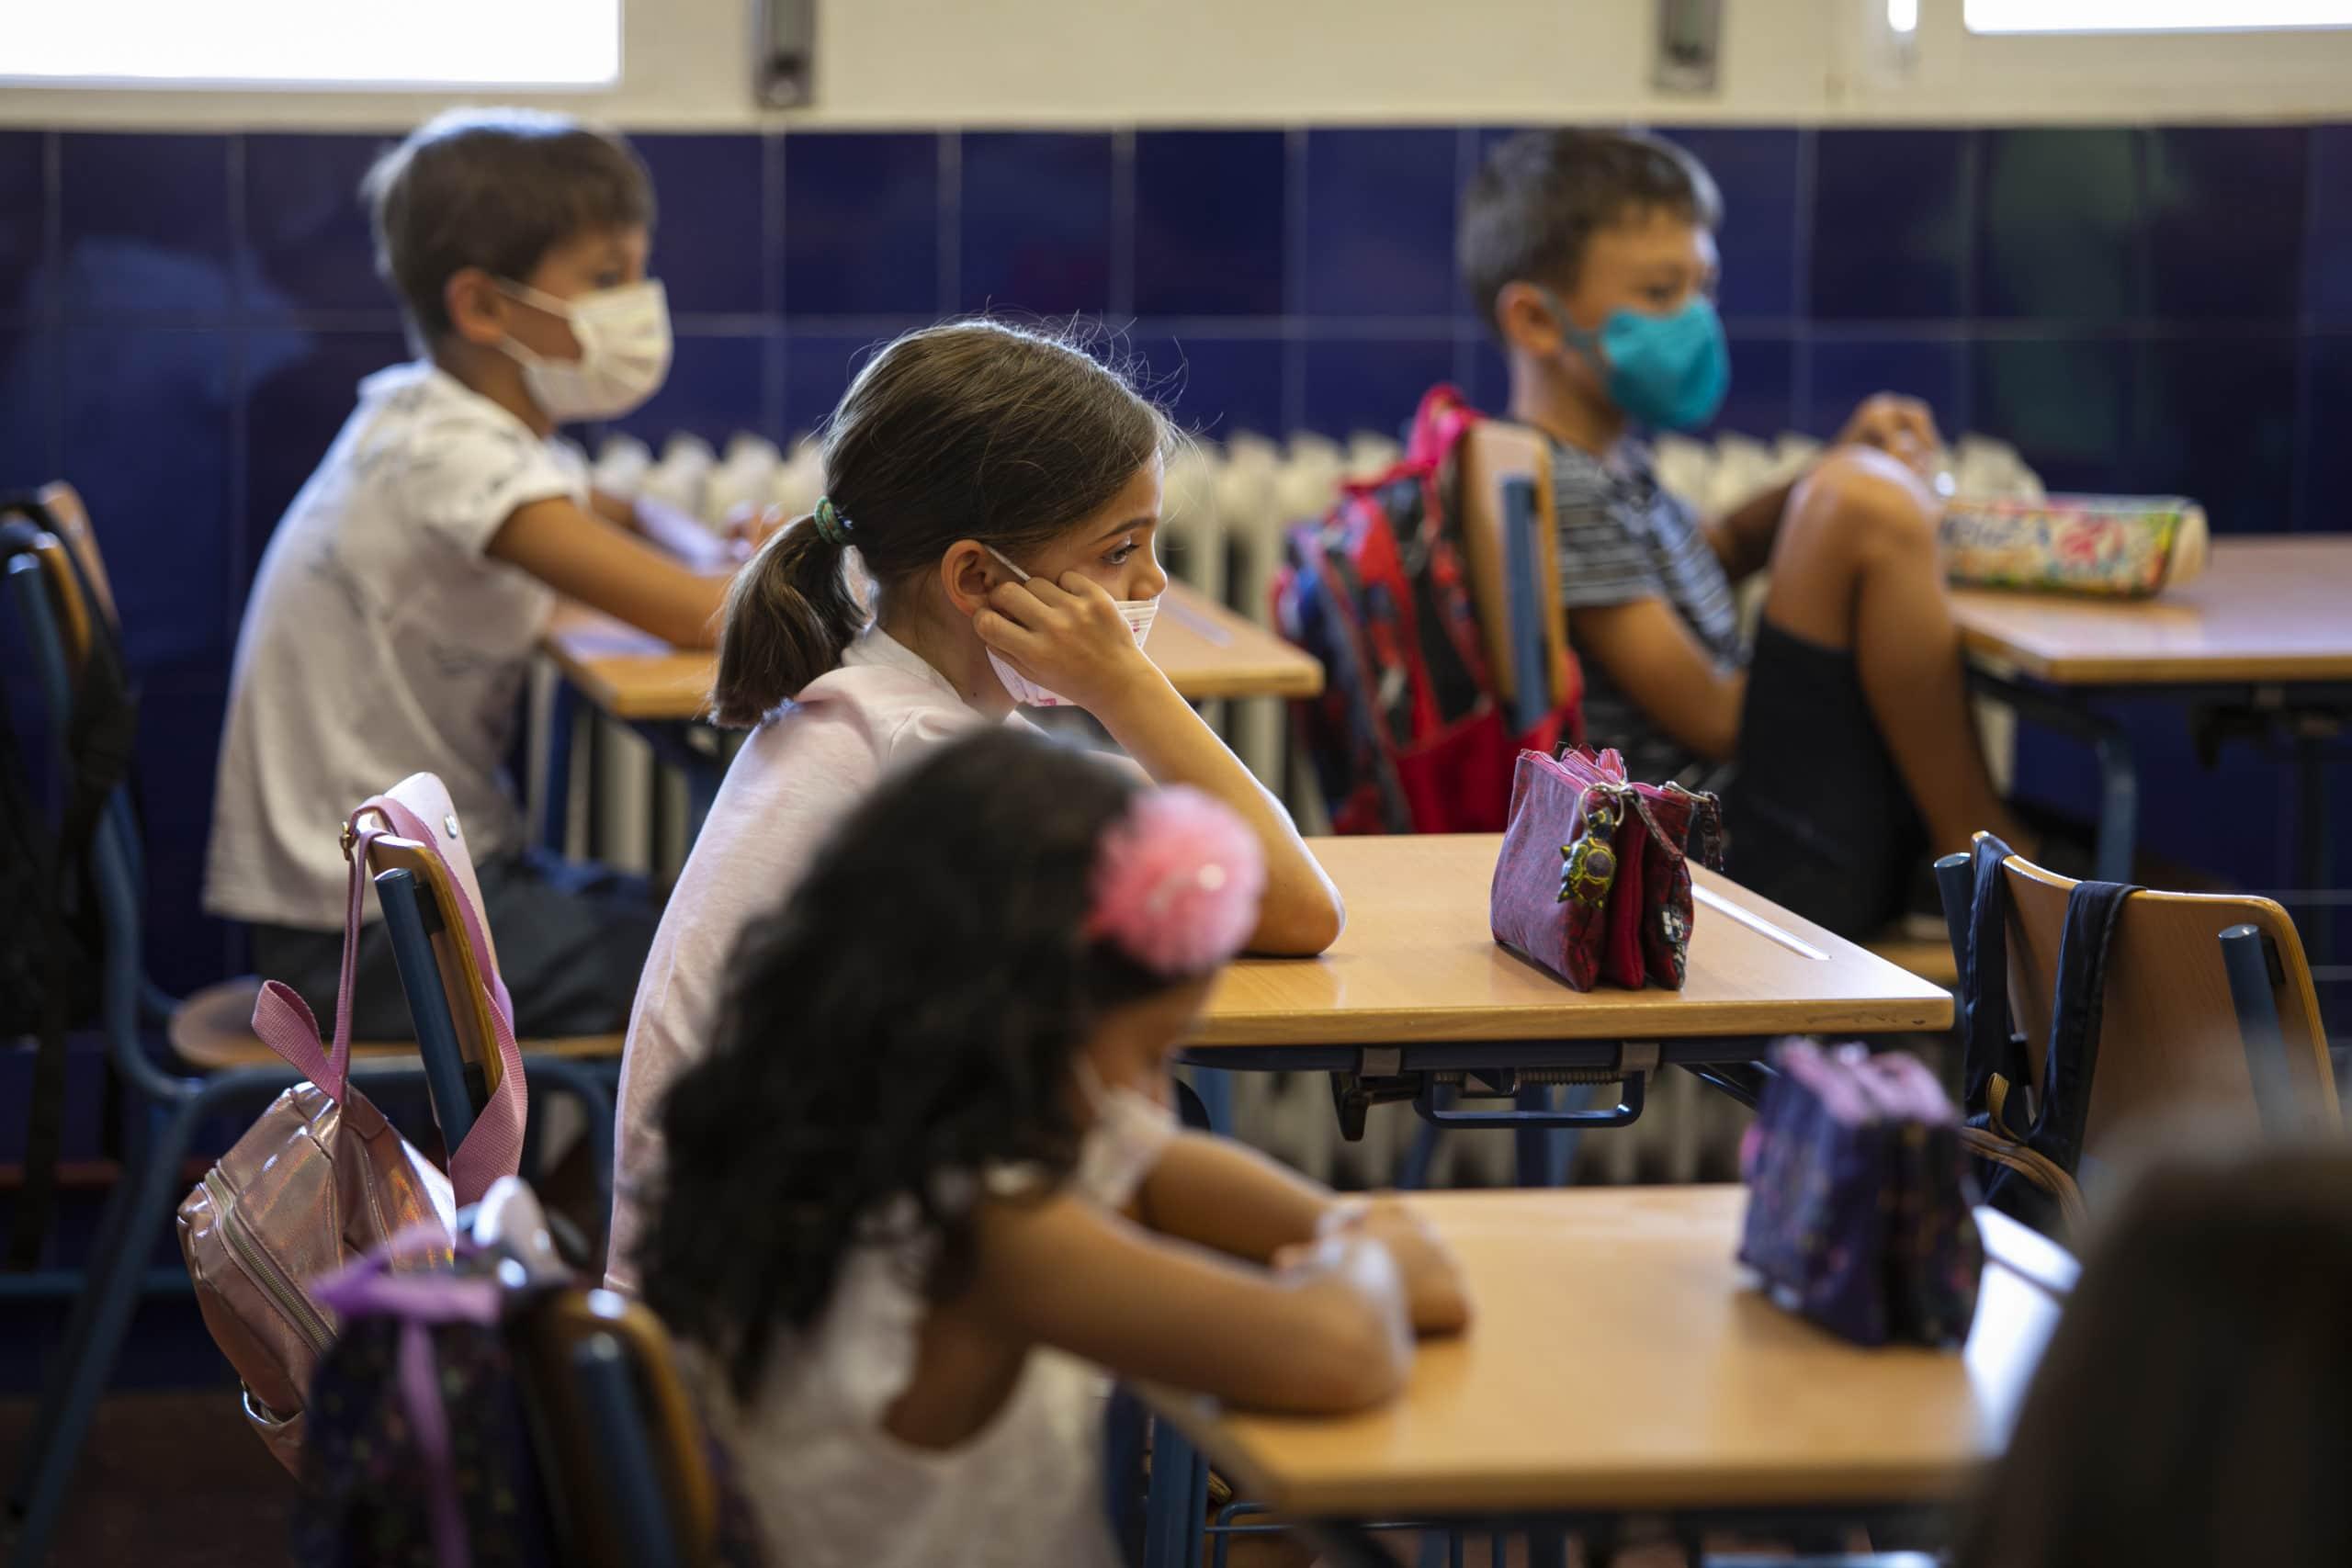 Opening of the Primary School Year in Granada, Spain amid the coronavirus pandemic